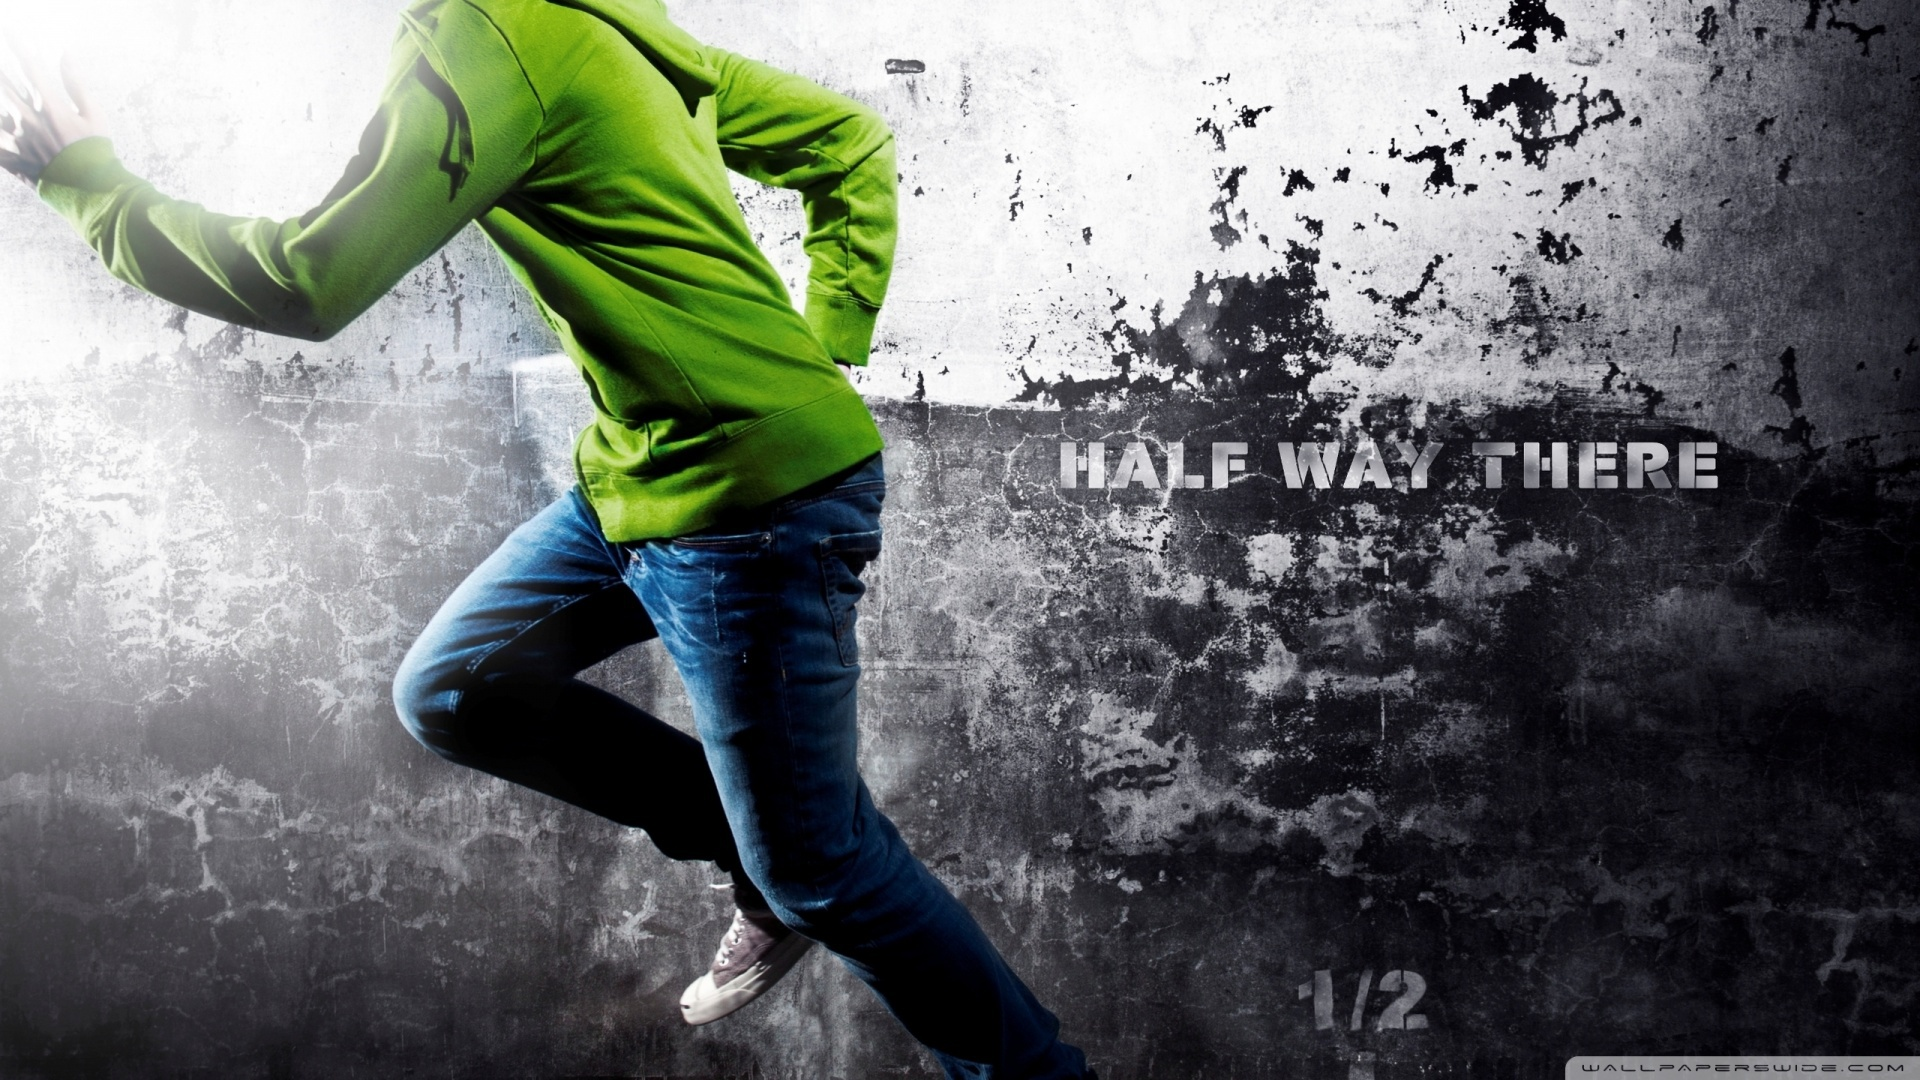 Free running wallpaper hd